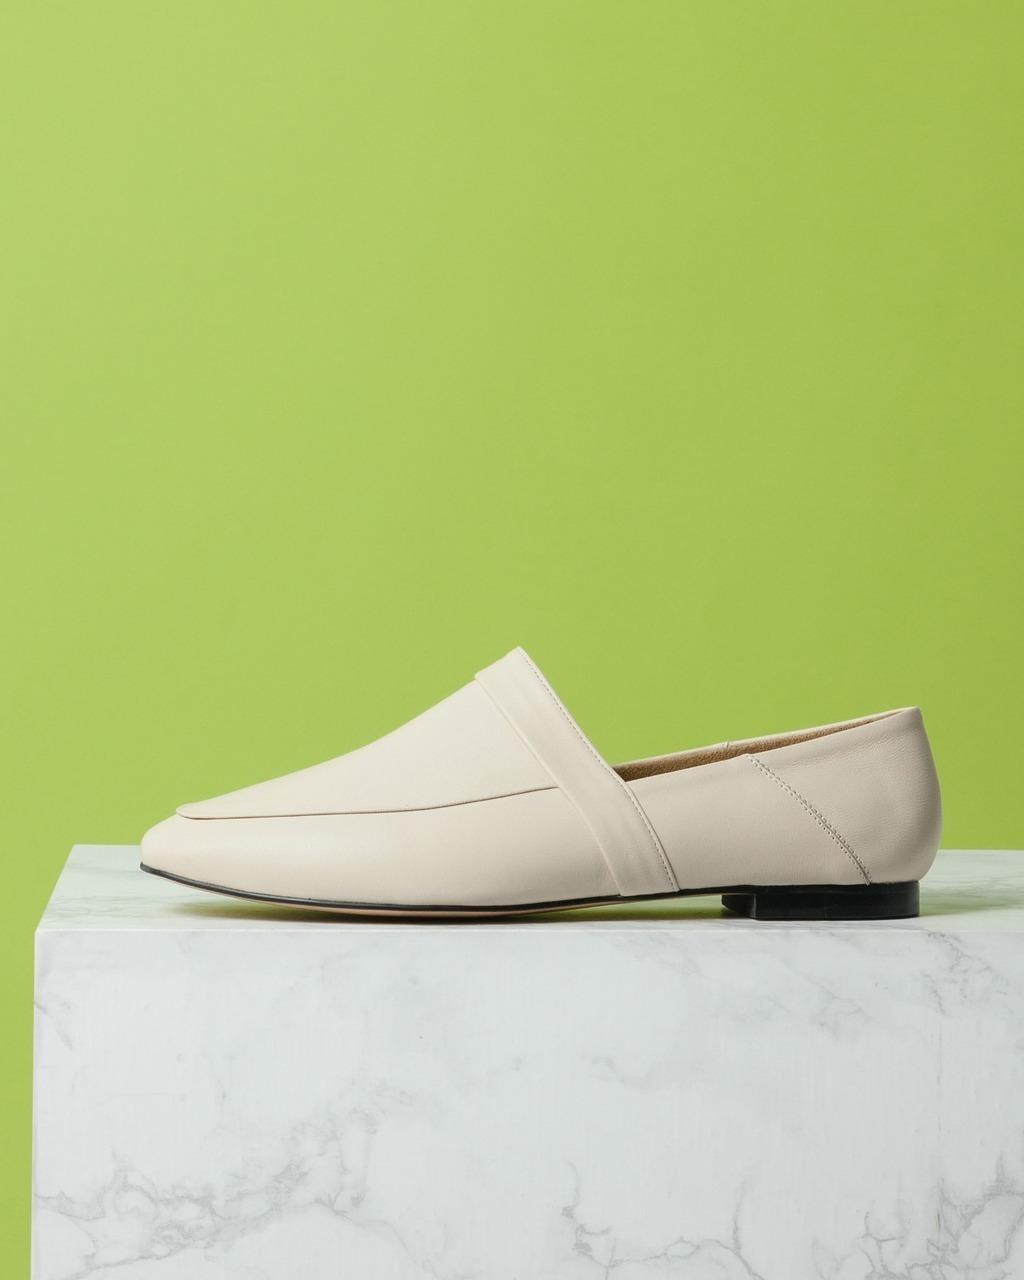 DORATORE Monti Cream - Women's Shoes : Republic of Korea